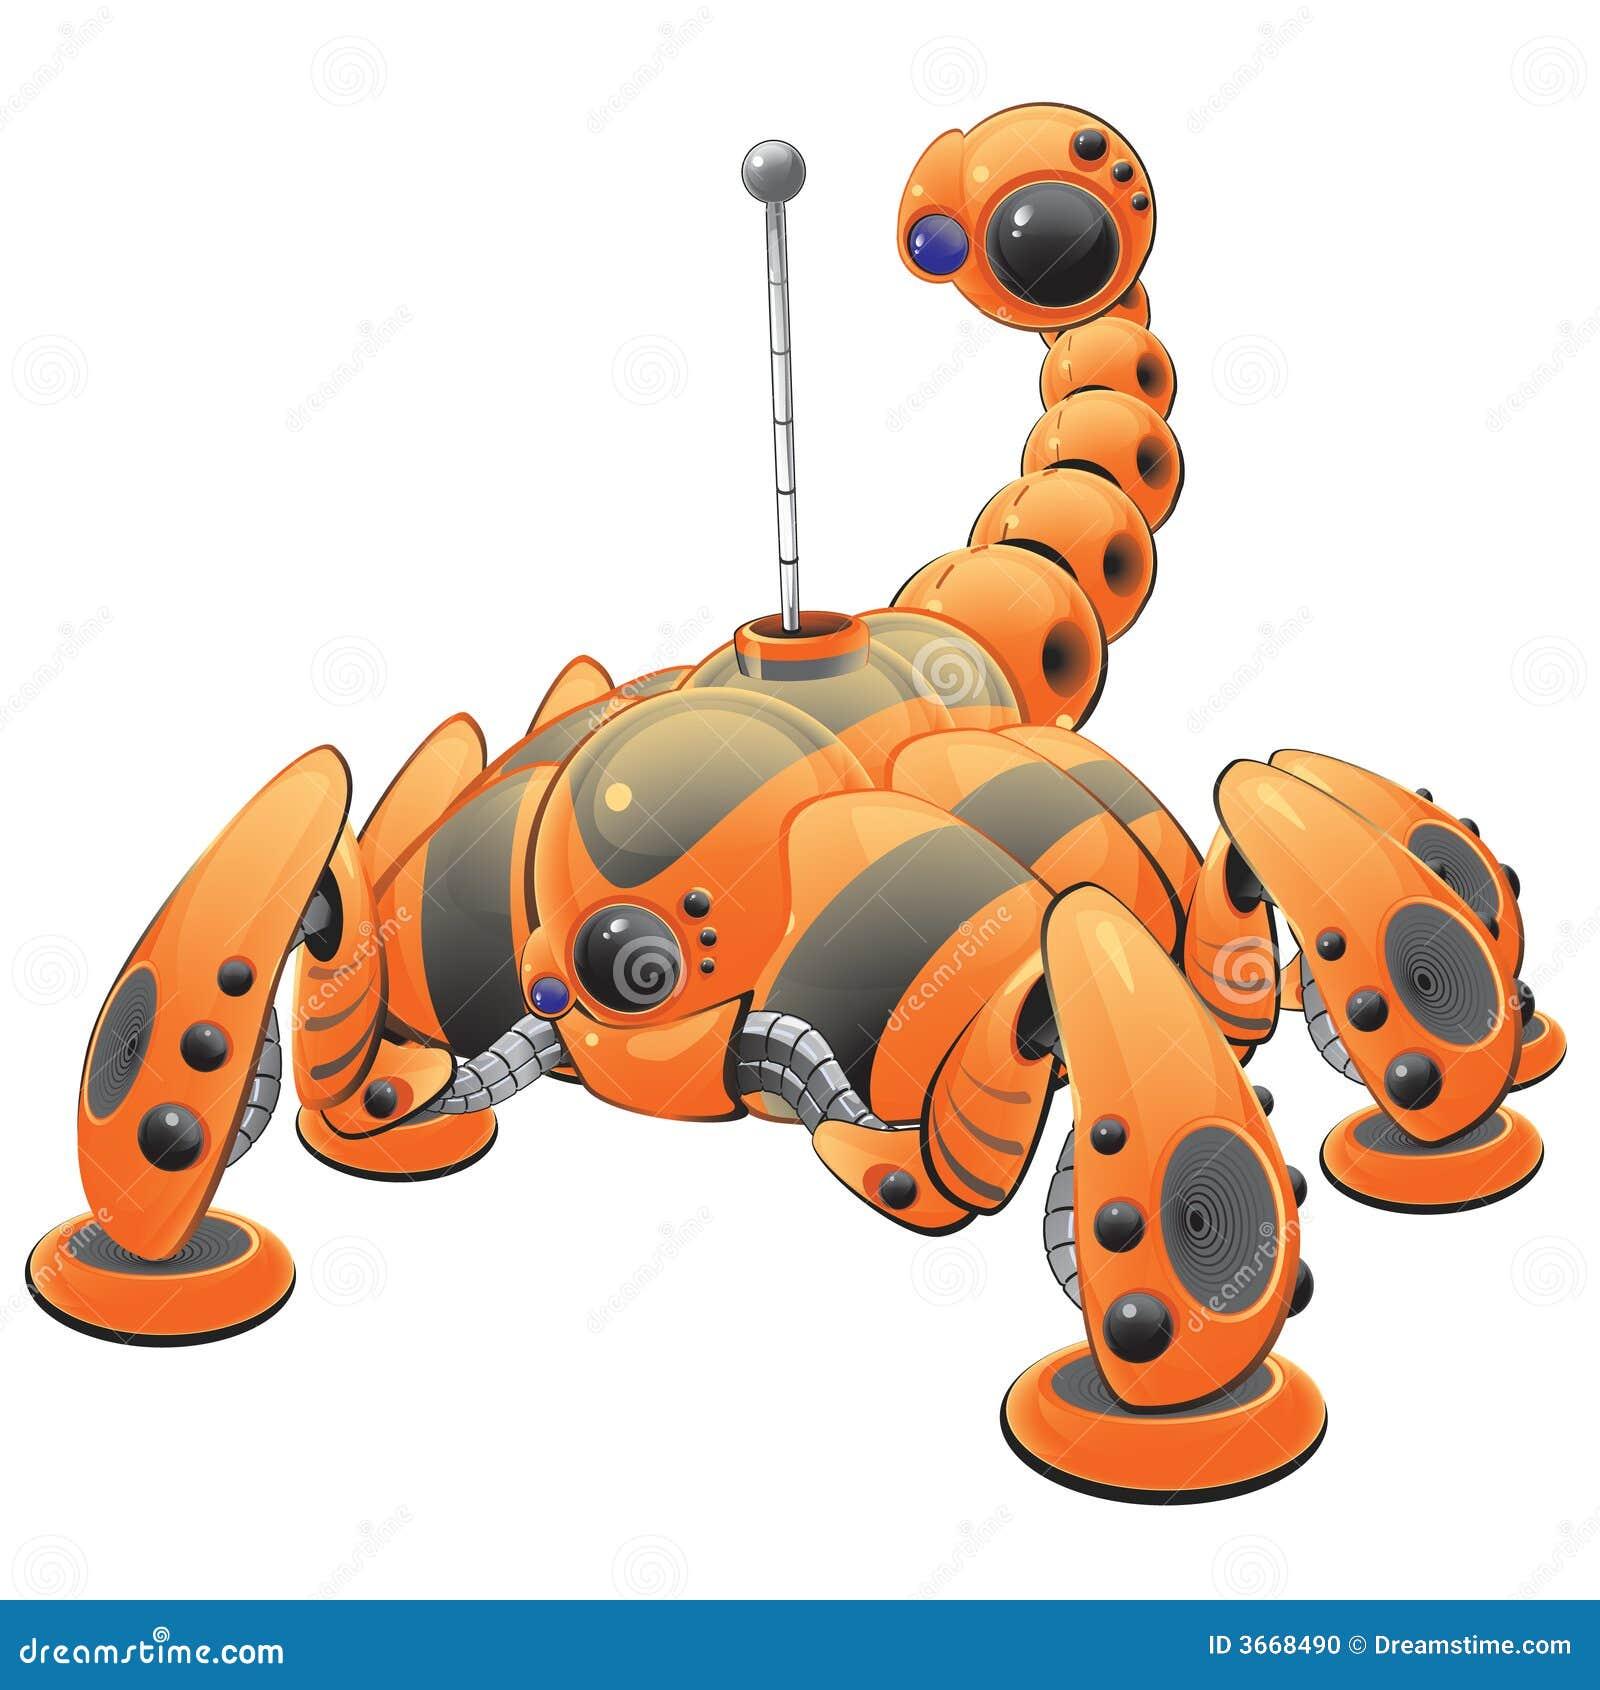 Orange Robot Illustration Editorial Image Image 3668490